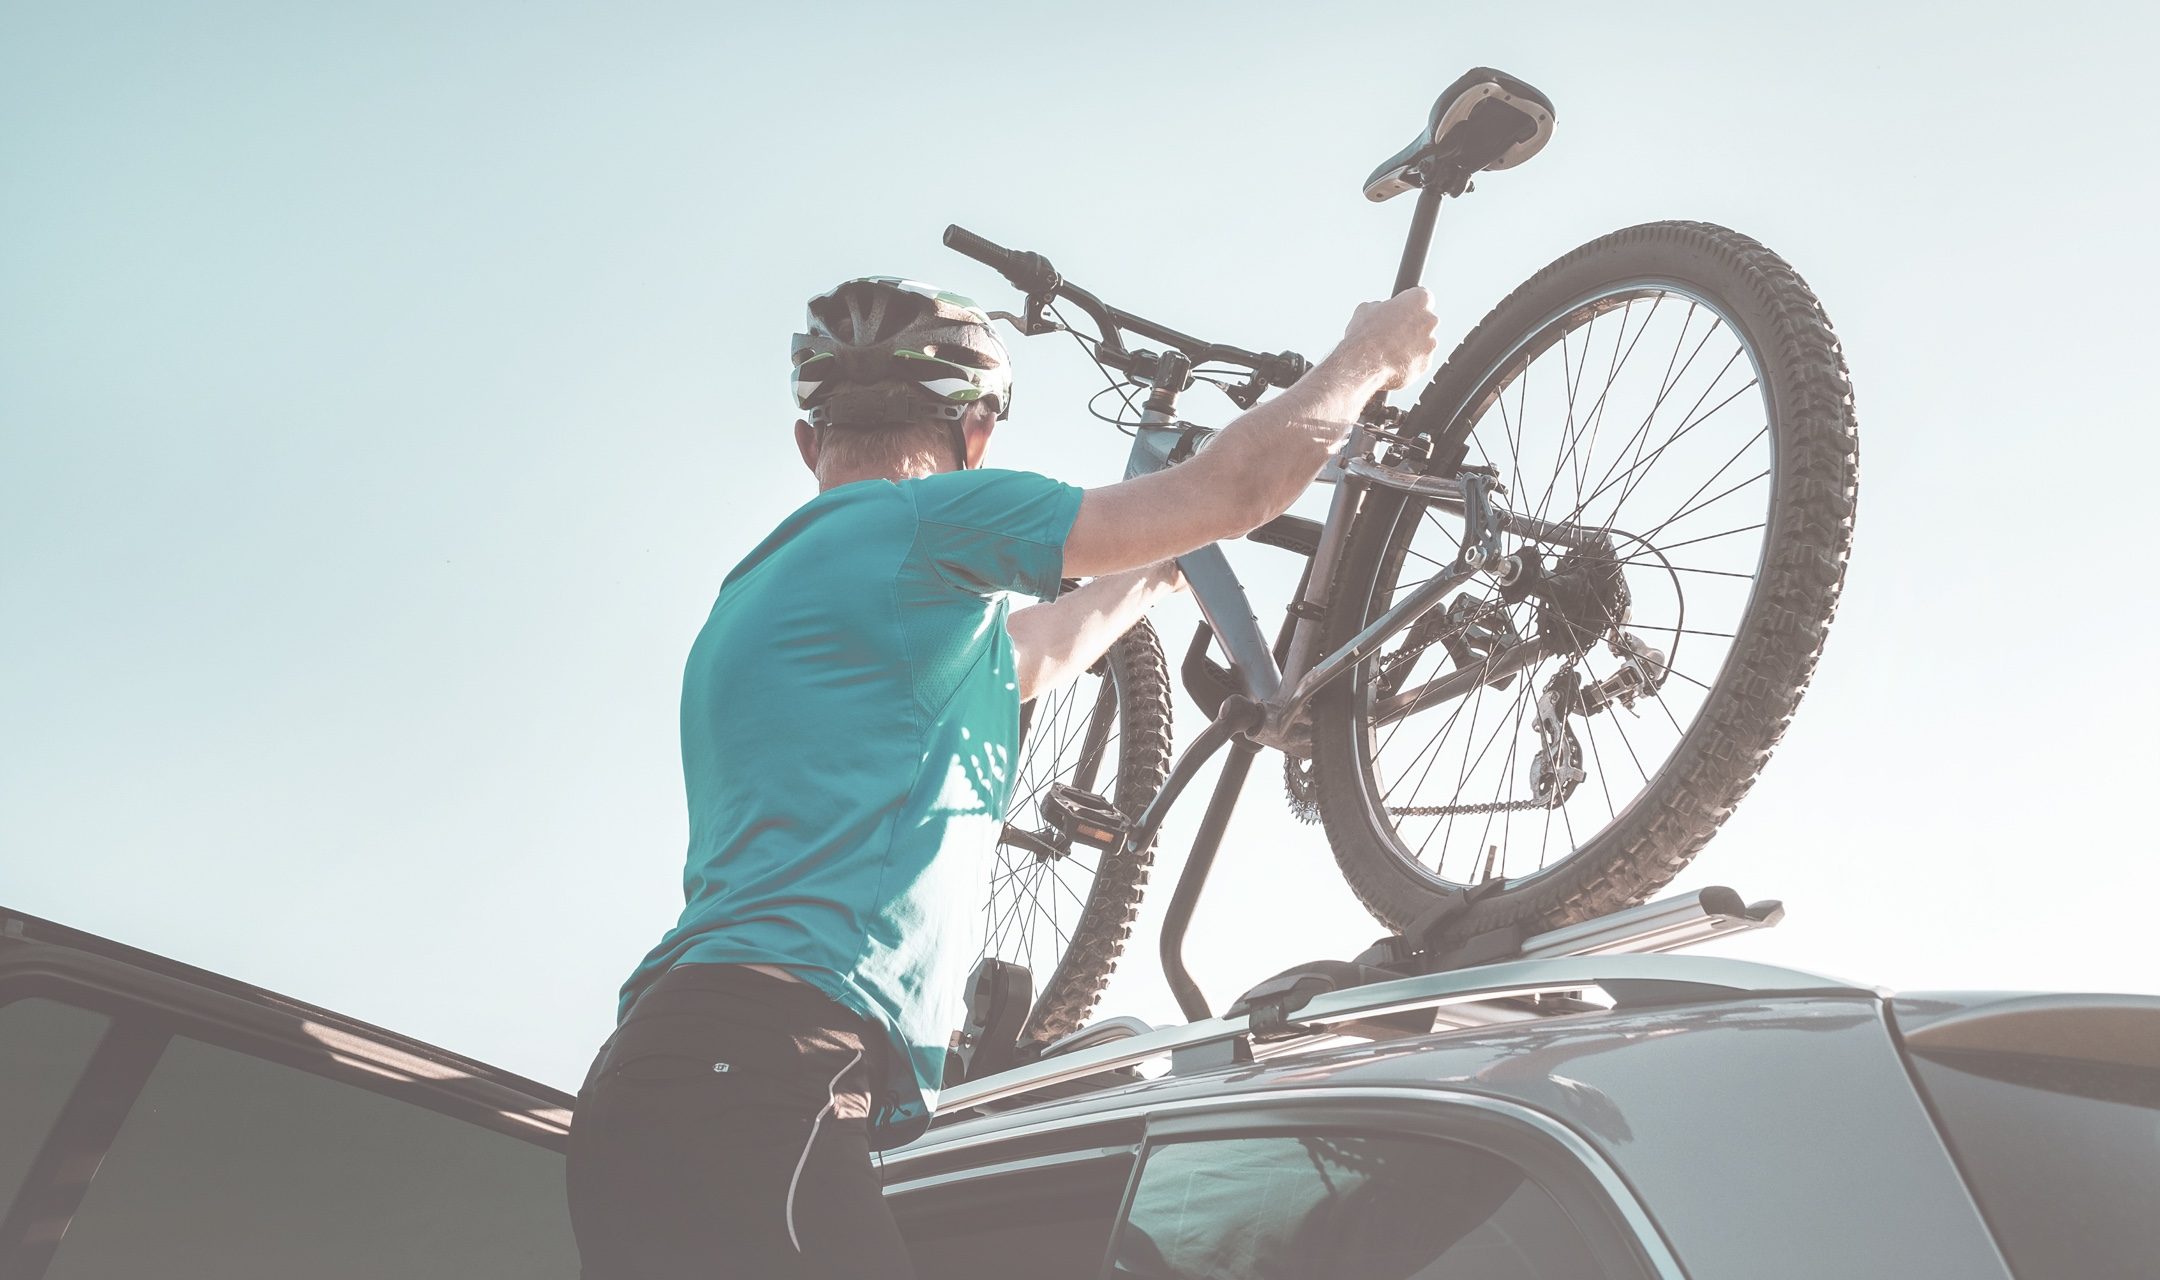 Bike-Rack Blunders